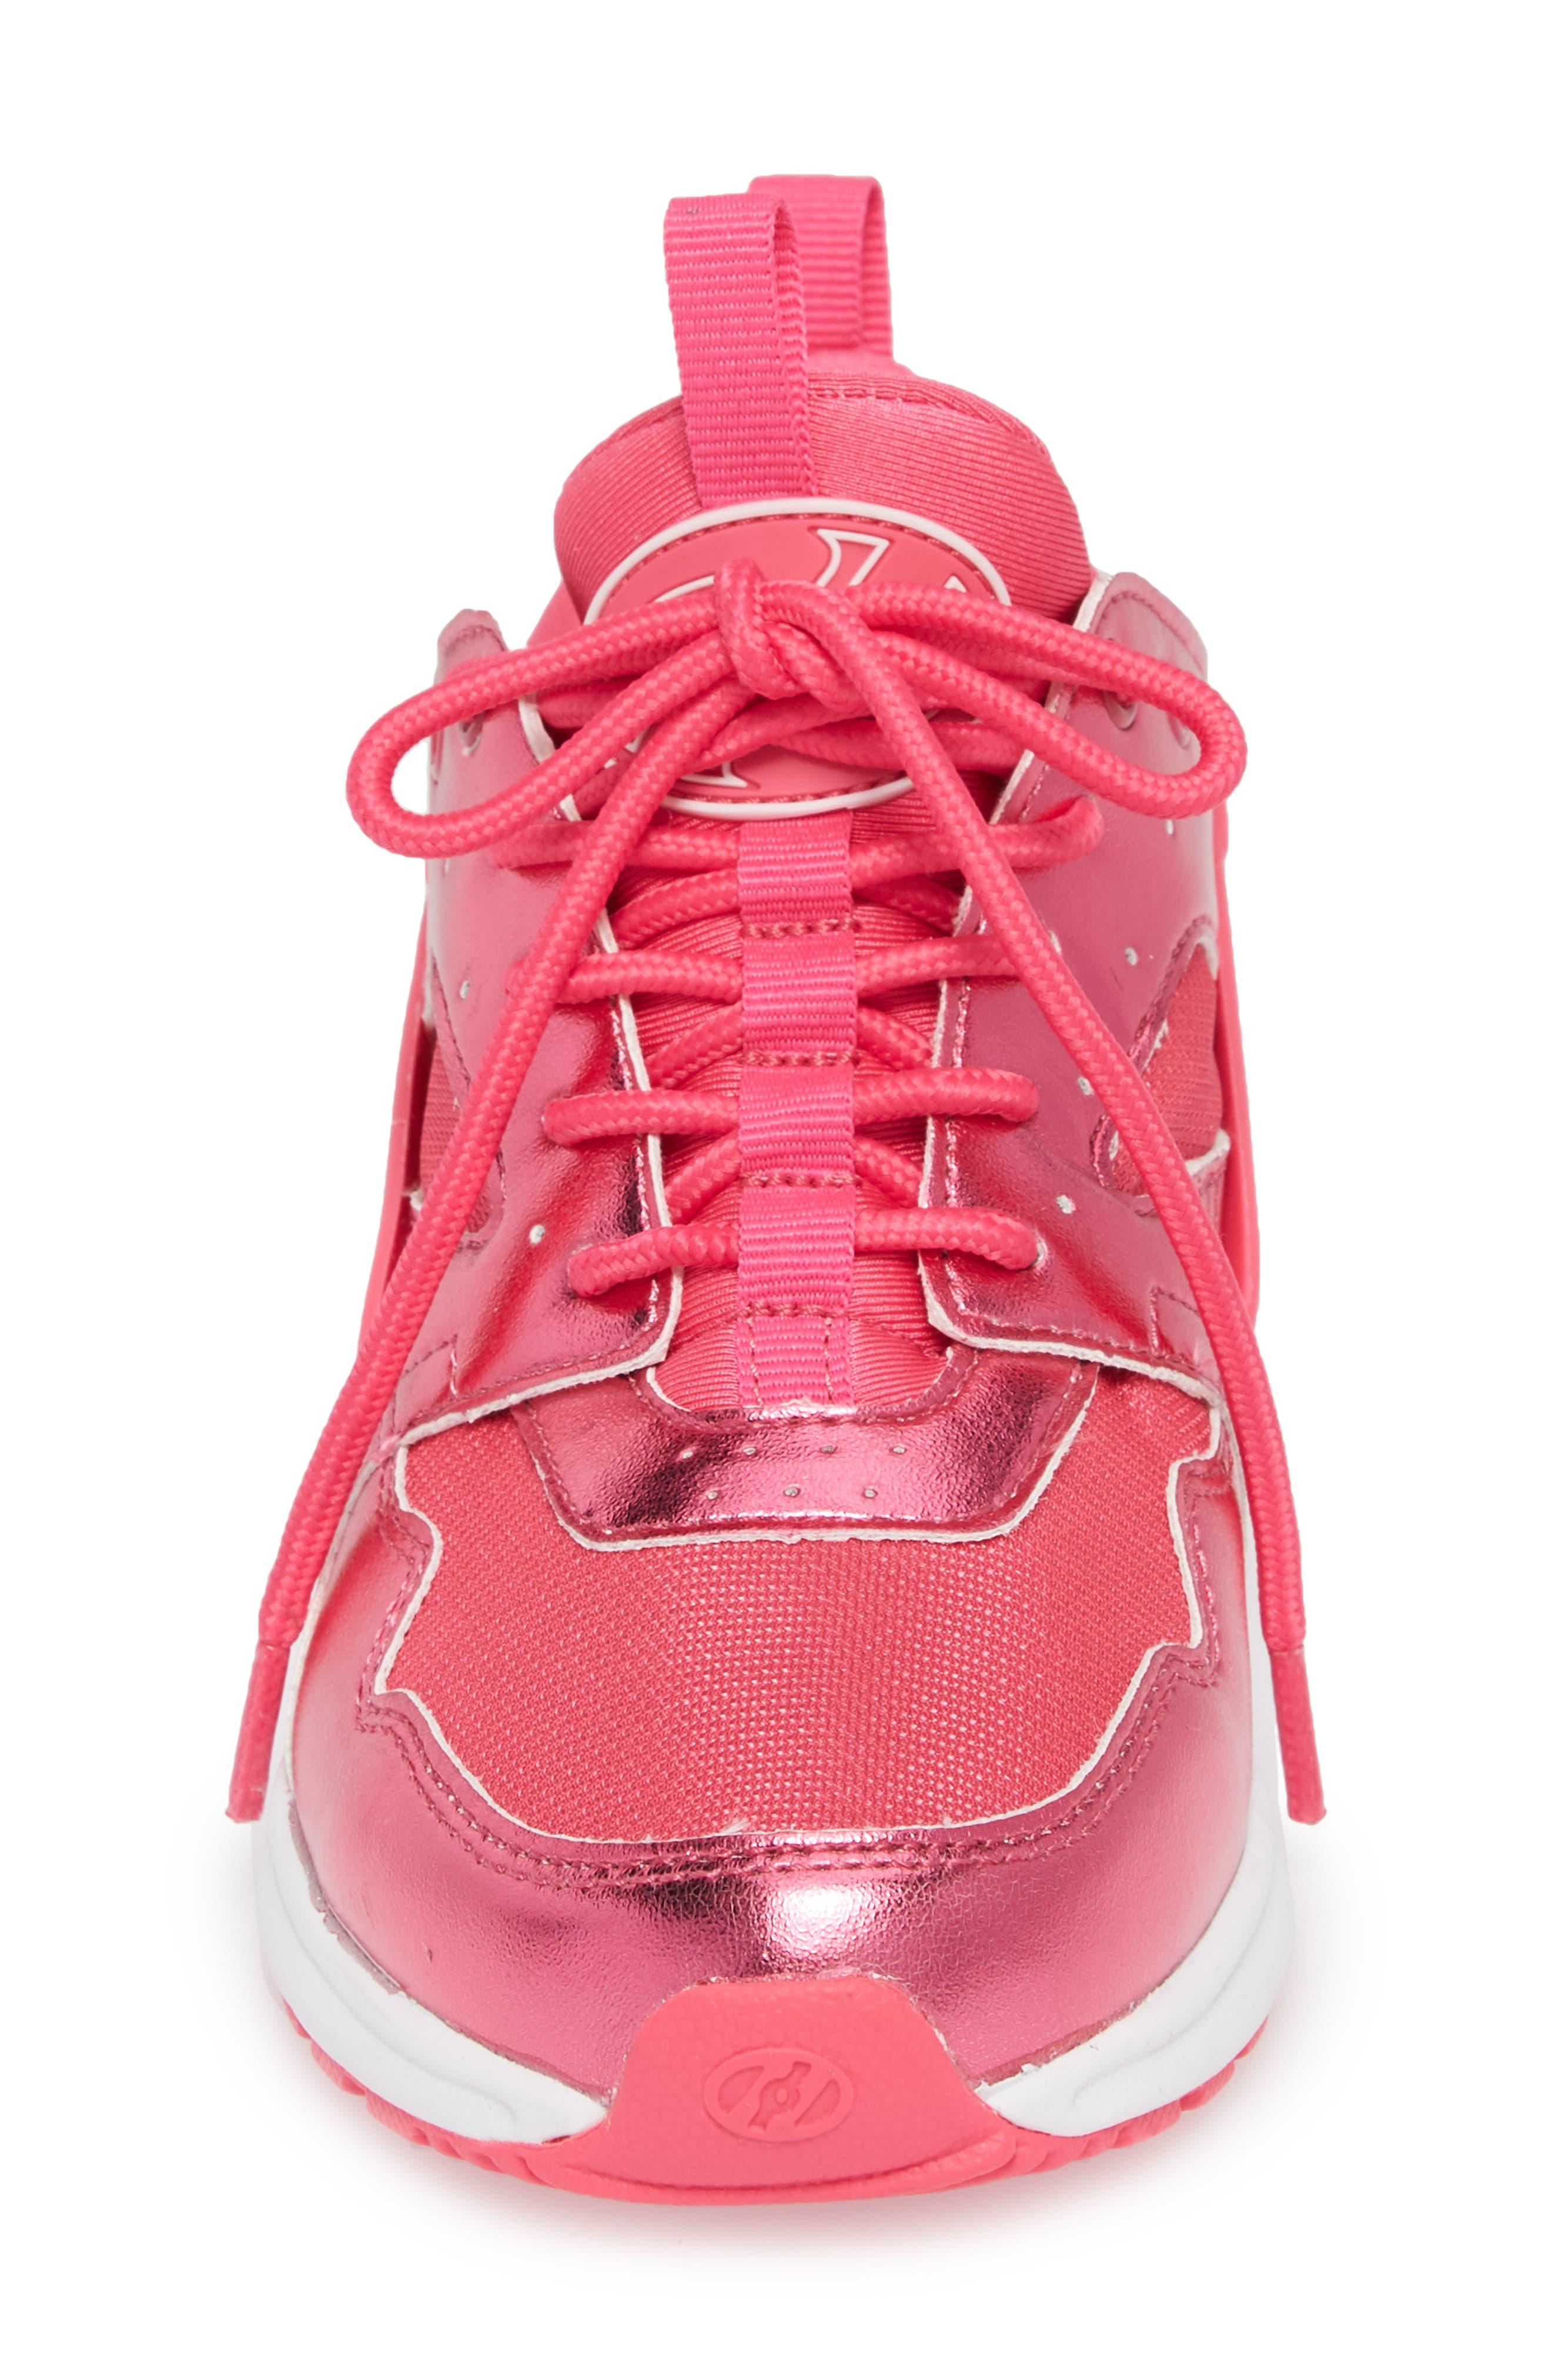 Force Sneaker,                             Alternate thumbnail 4, color,                             PINK